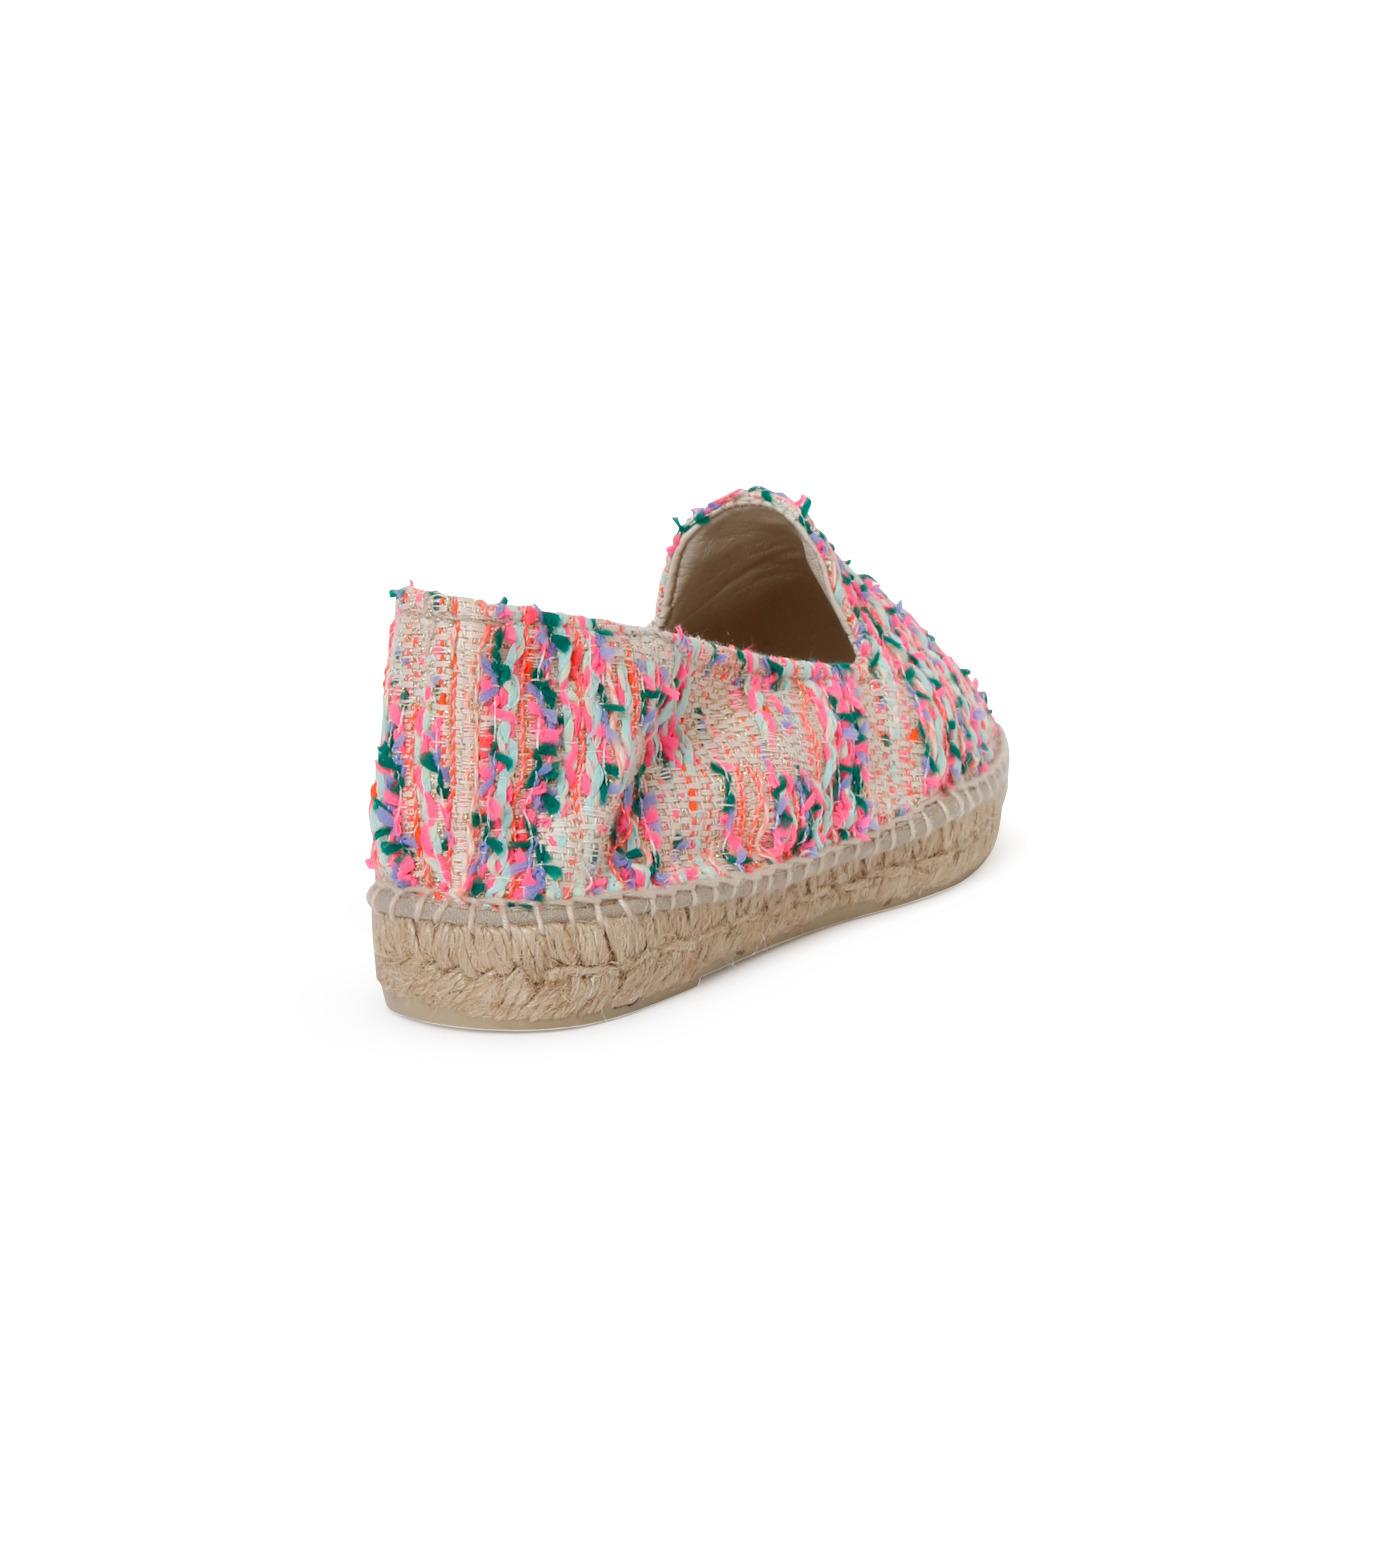 Manebi(マネビ)のneon tweed slippers-NEON PINK(シューズ/shoes)-V-4-3-N-70 拡大詳細画像3